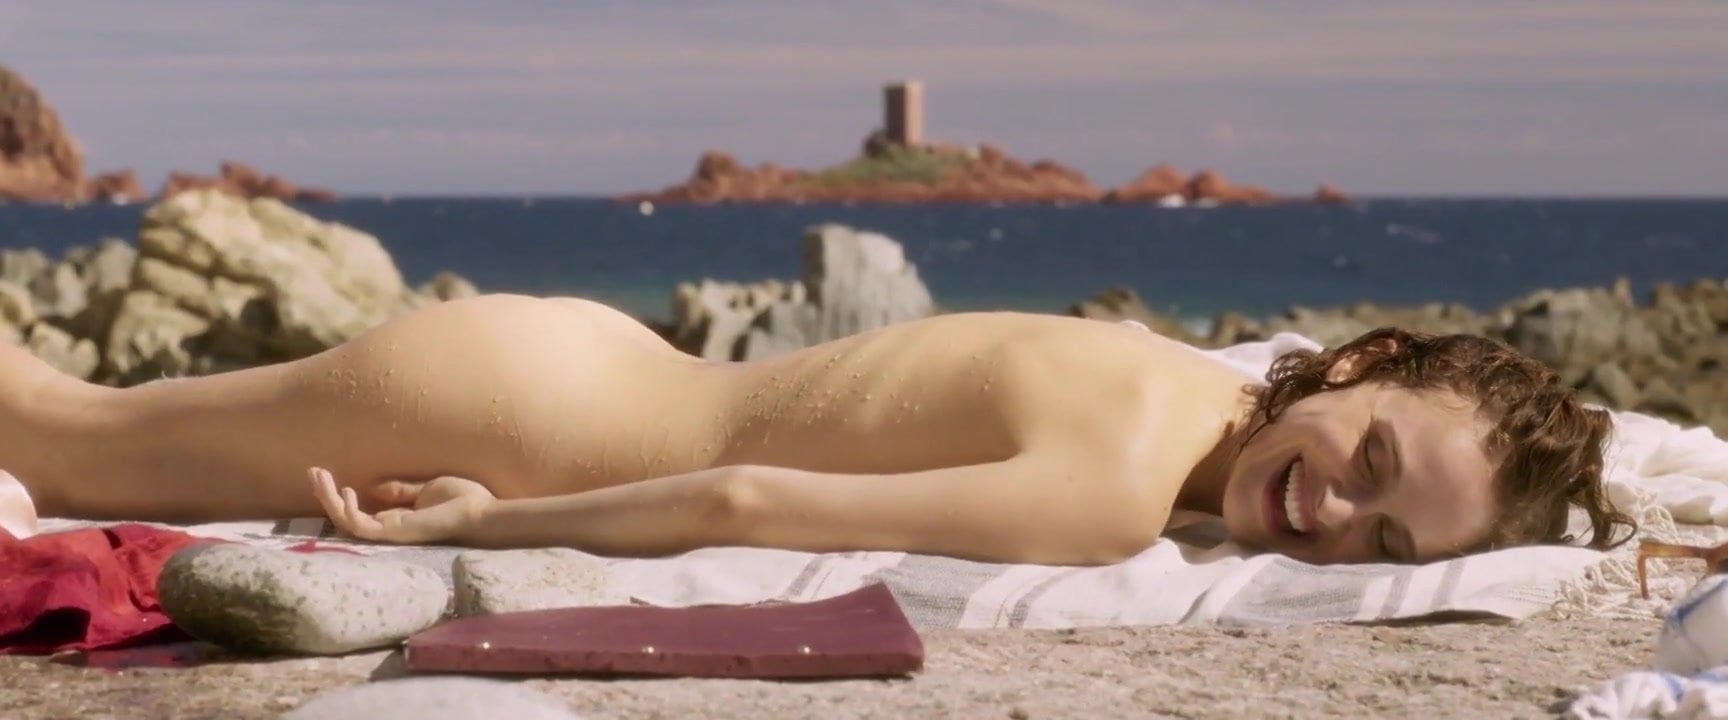 Natalie portman desnuda — photo 12